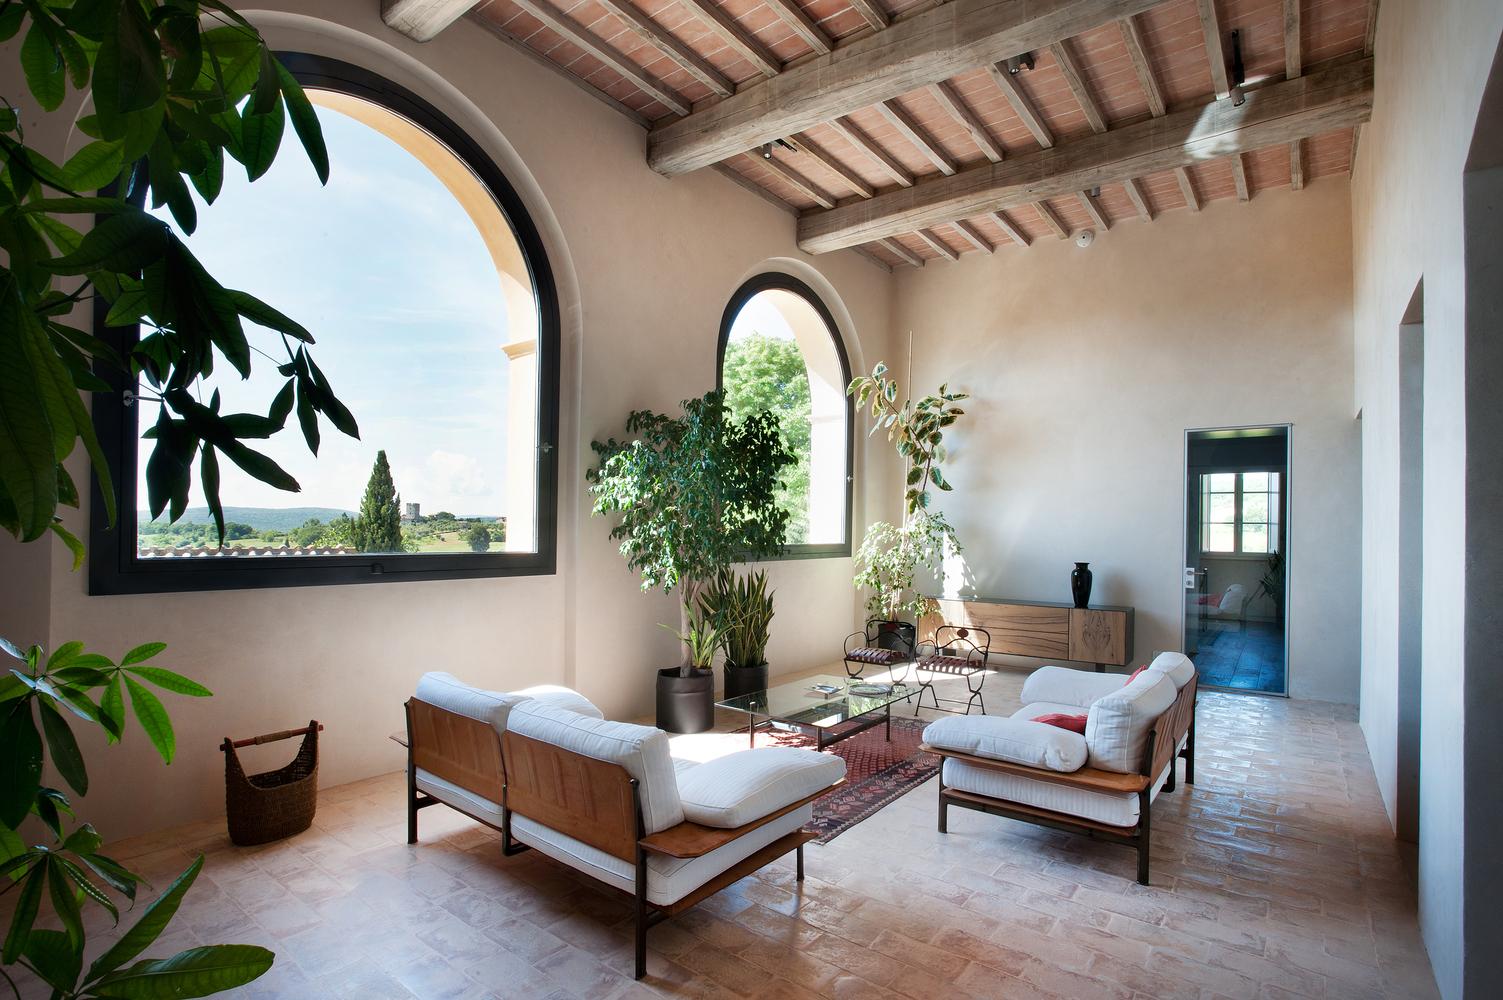 italian home interior design 2. 15th Century Italian Villa Renovation by CMT Architects 2  Your